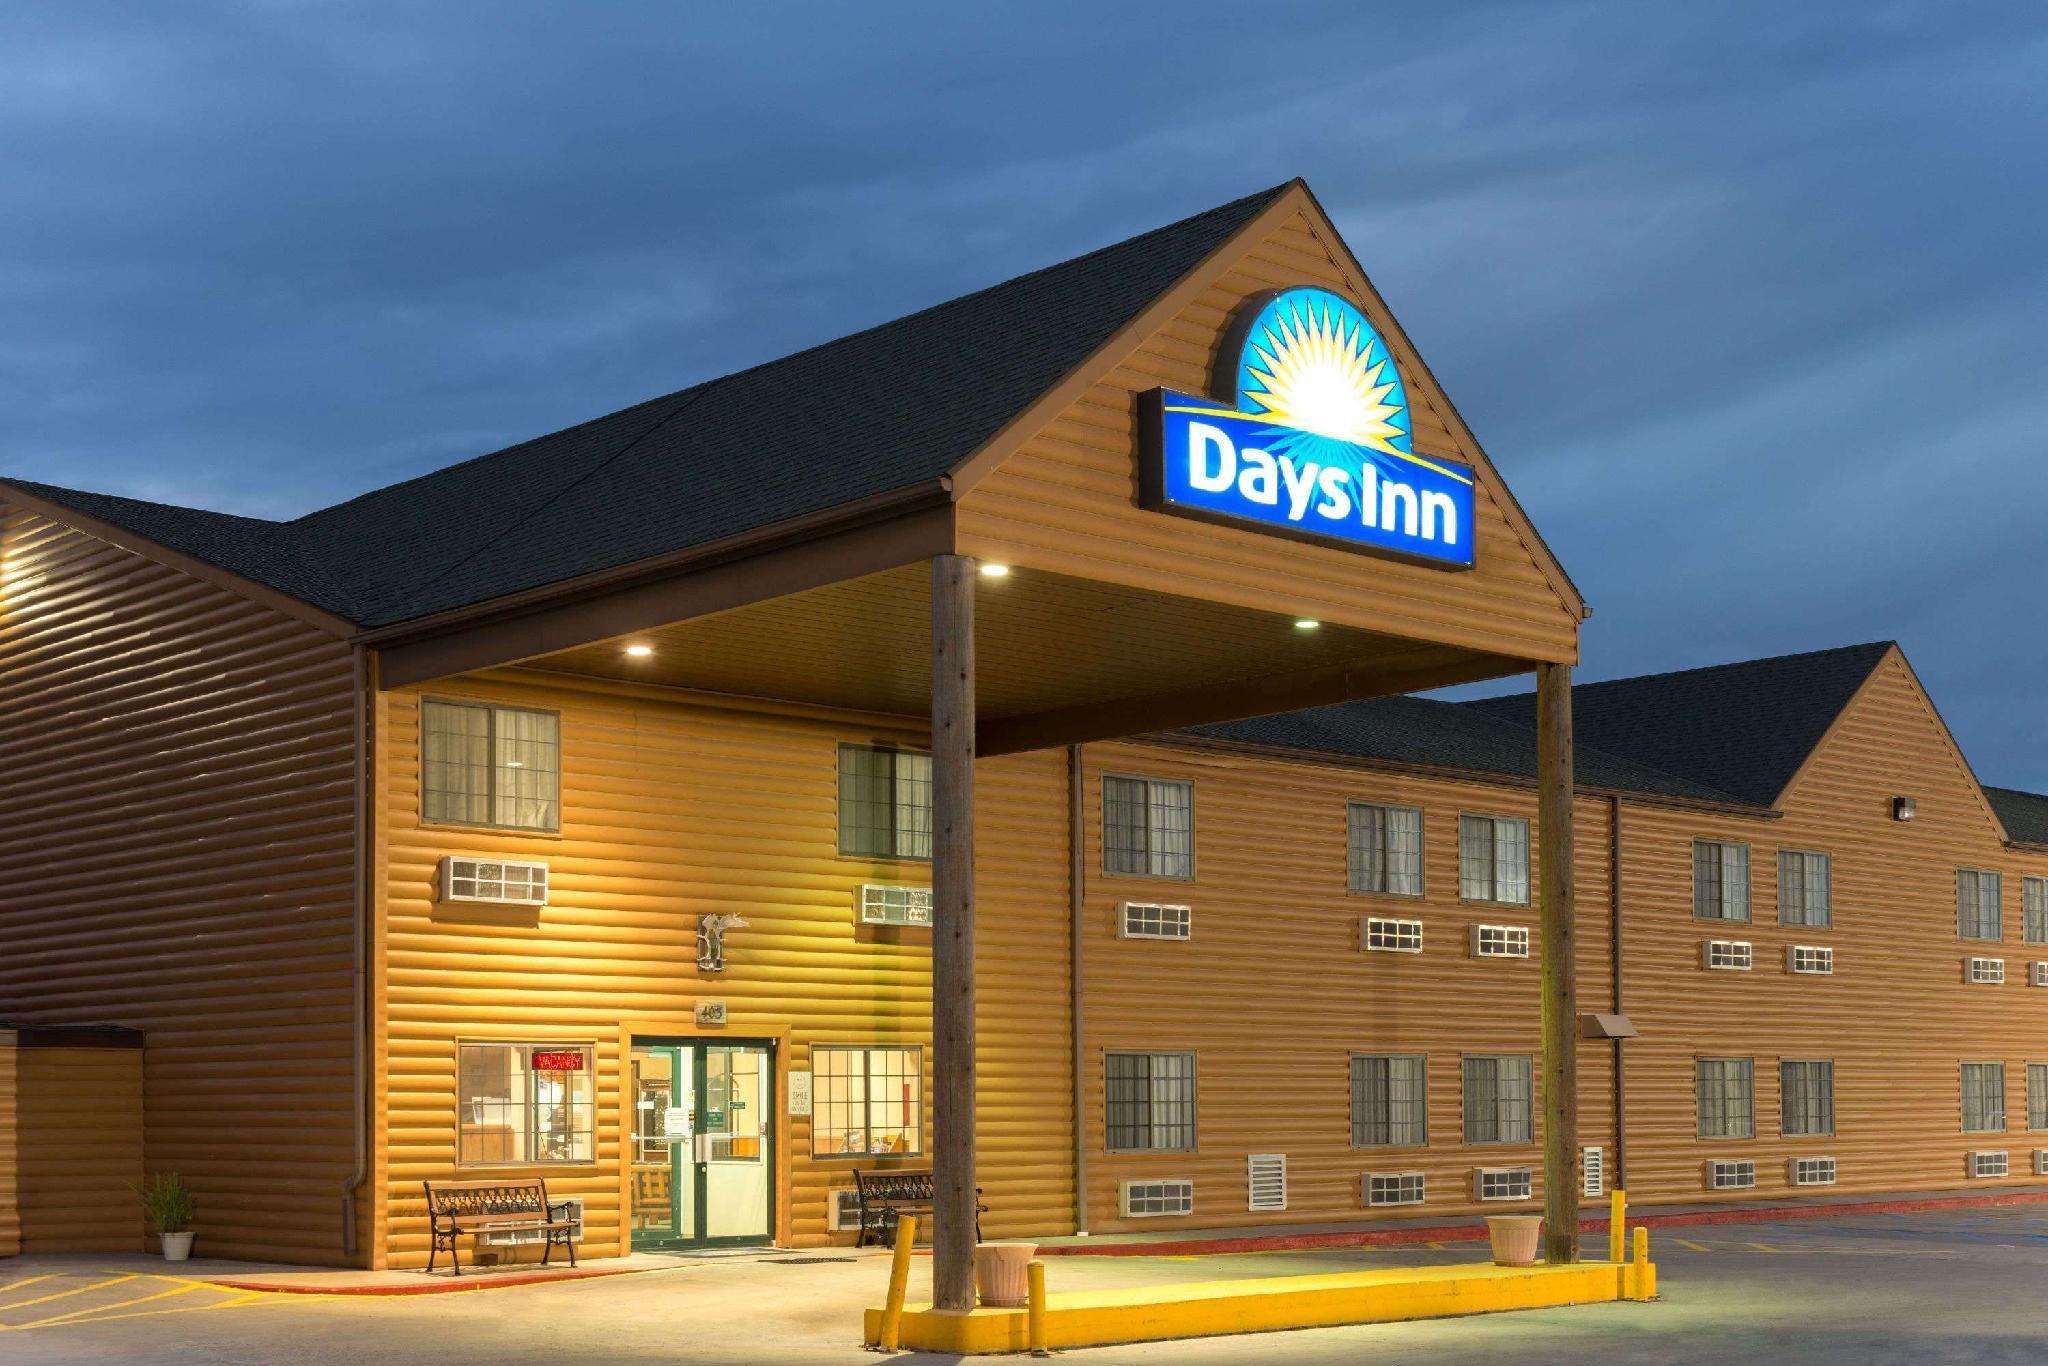 Days Inn By Wyndham New Florence